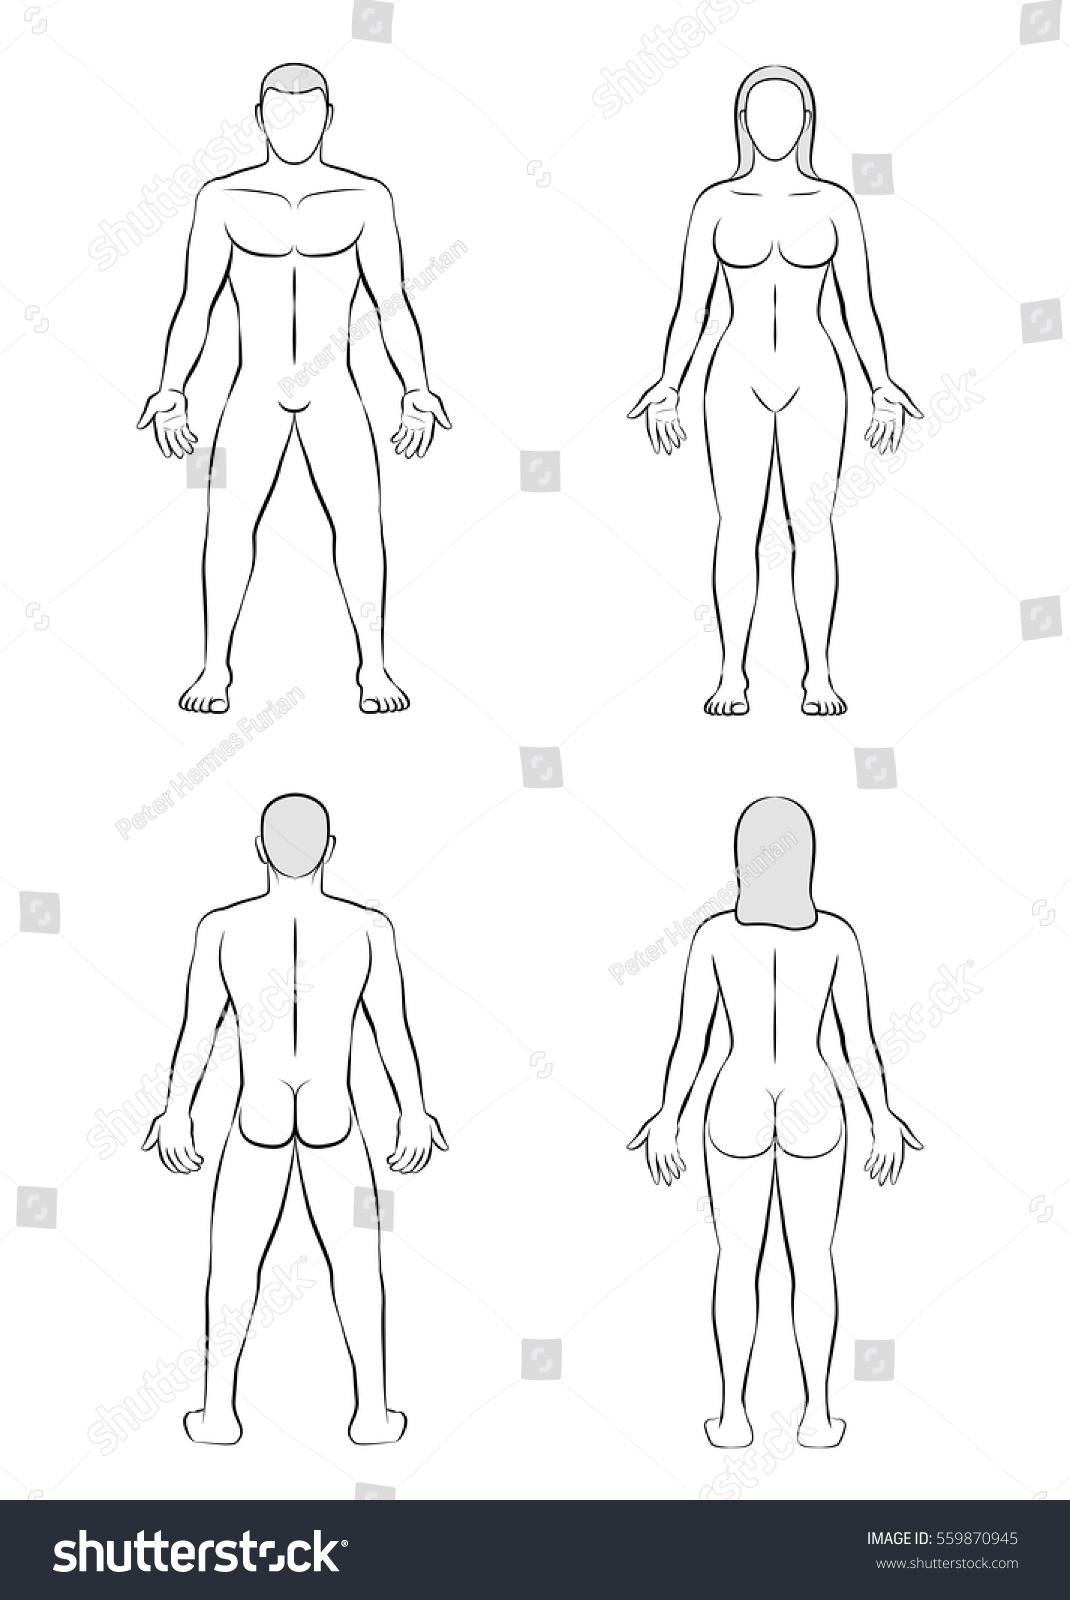 Man Woman Posterior Anterior View Outline Stock Vector ...